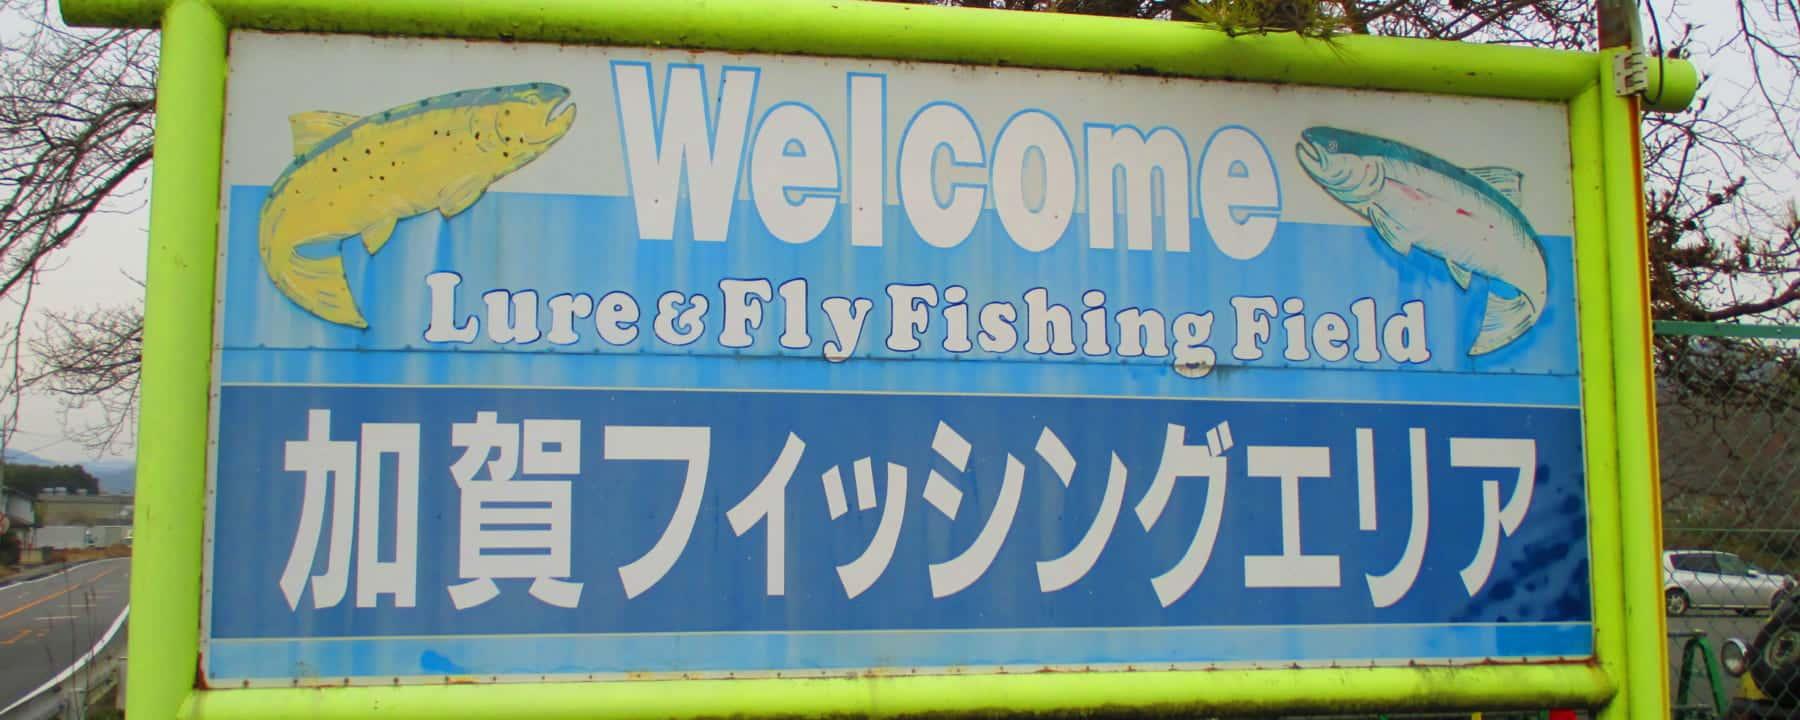 KAGA fishing